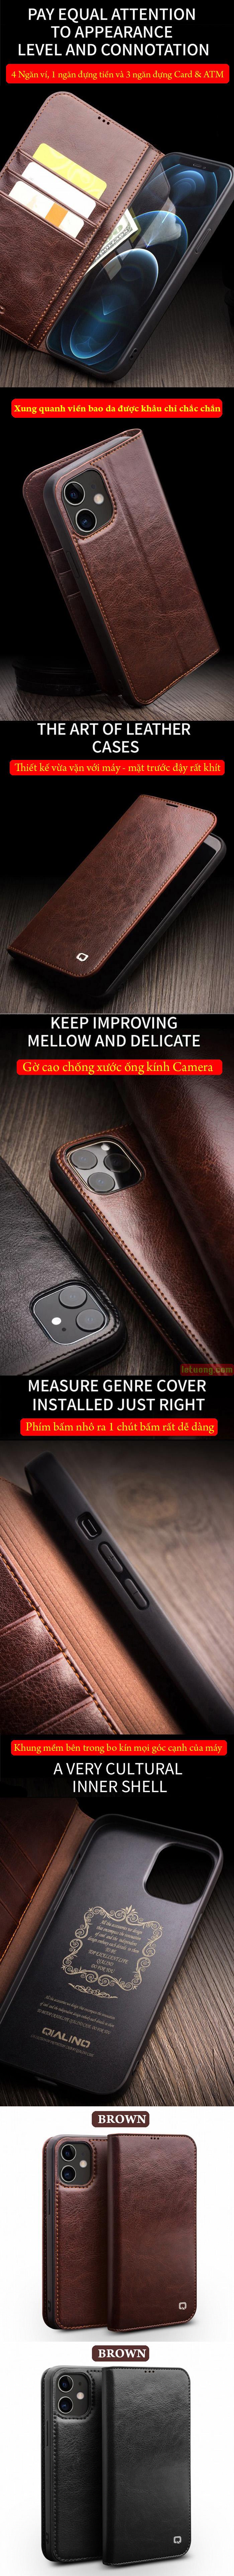 Bao da iPhone 12 Pro, iPhone 12 Qialino Classic Leather Hanmade da thật 7